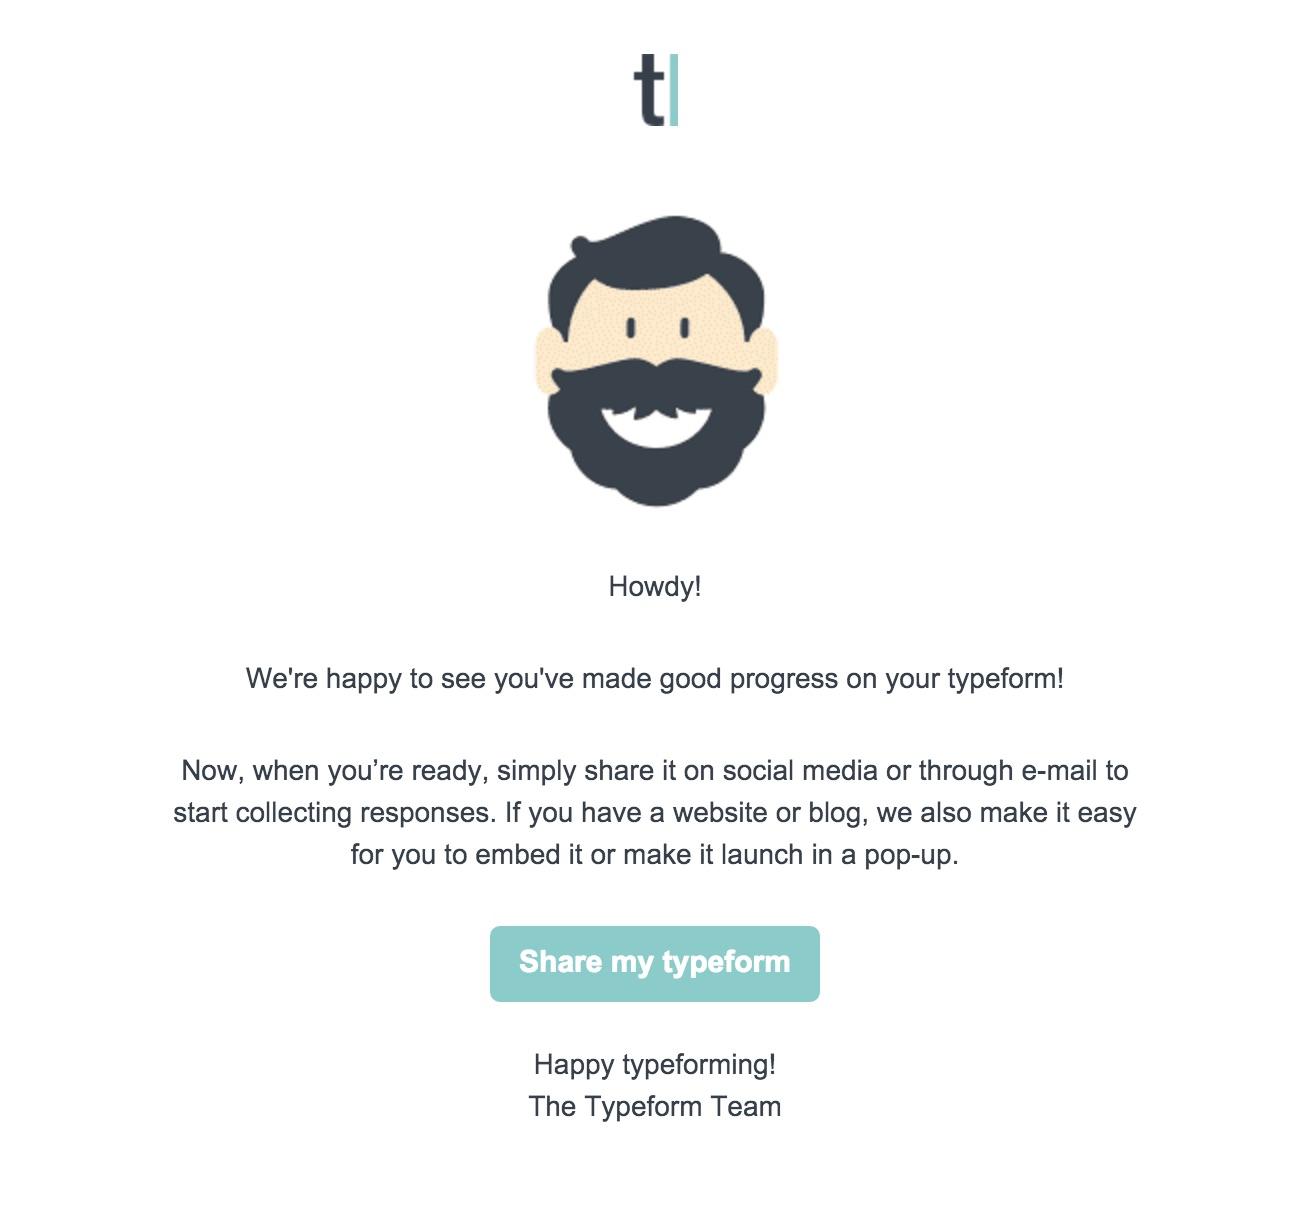 Typeform user onboarding email